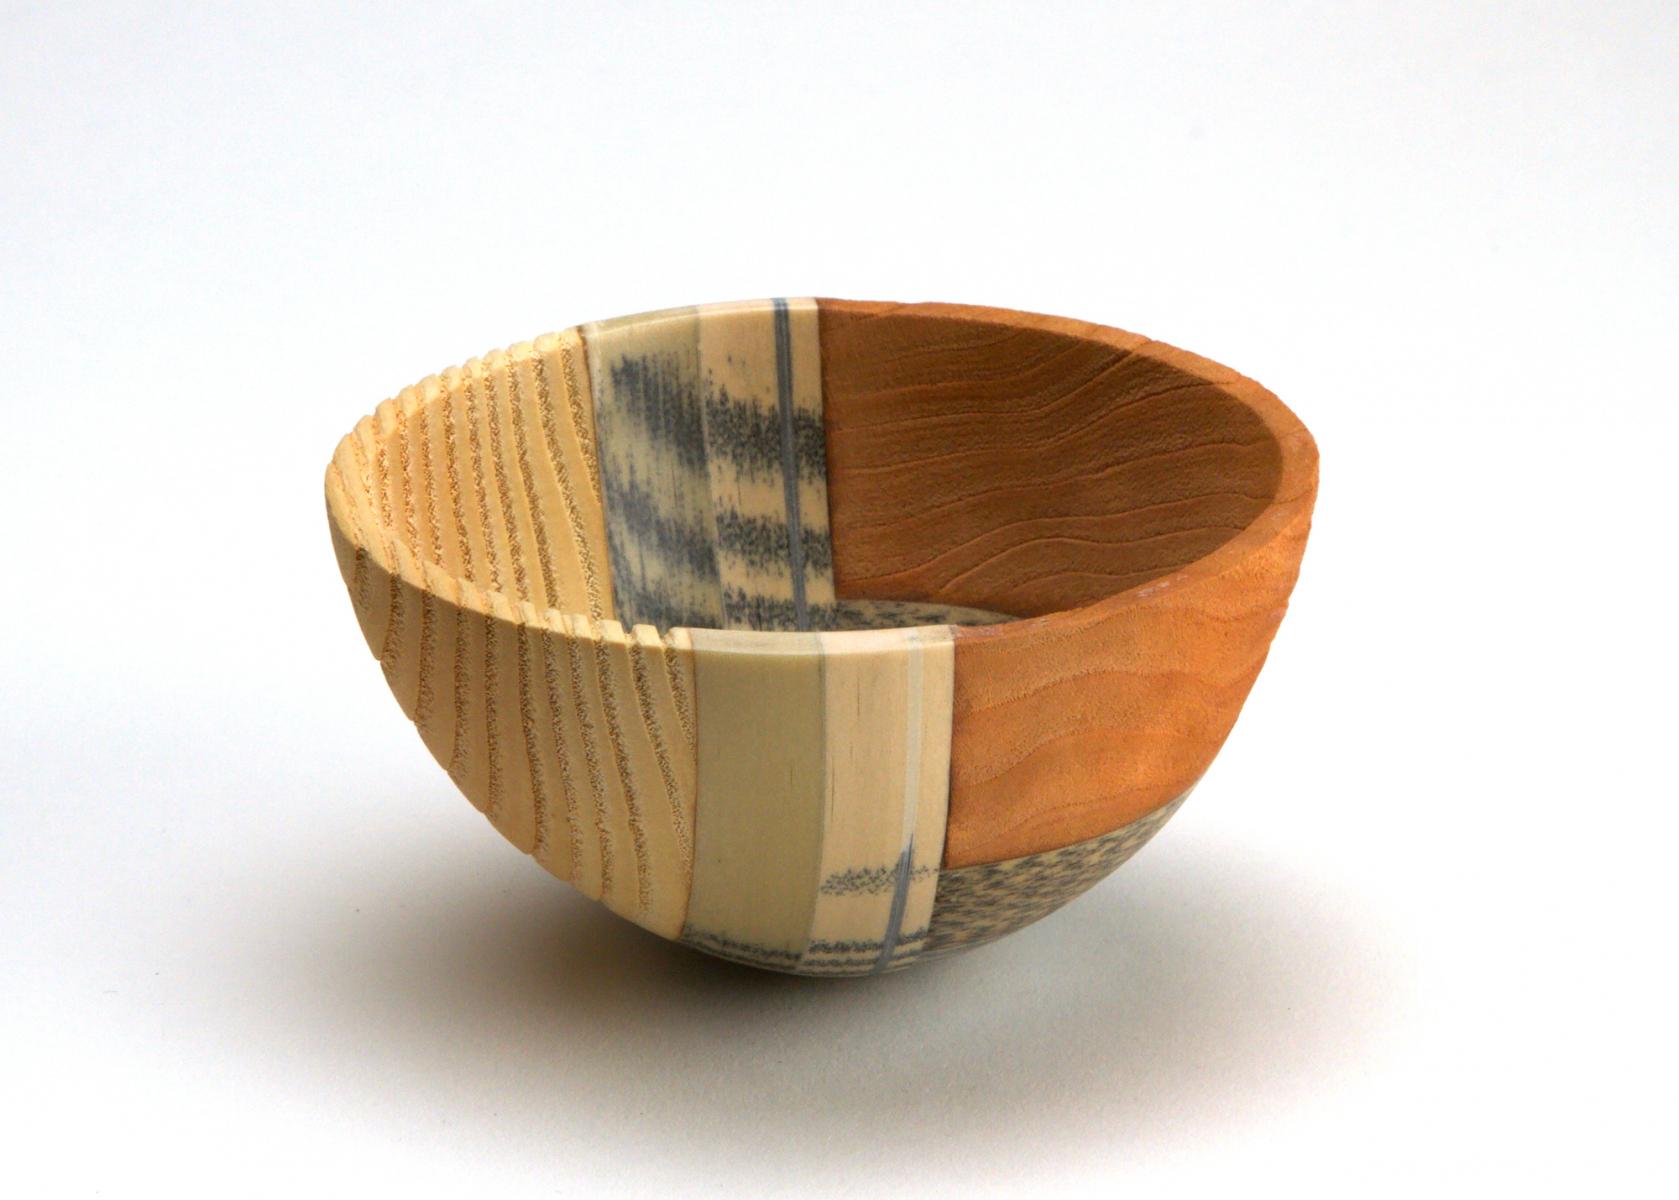 Bowl_2_1